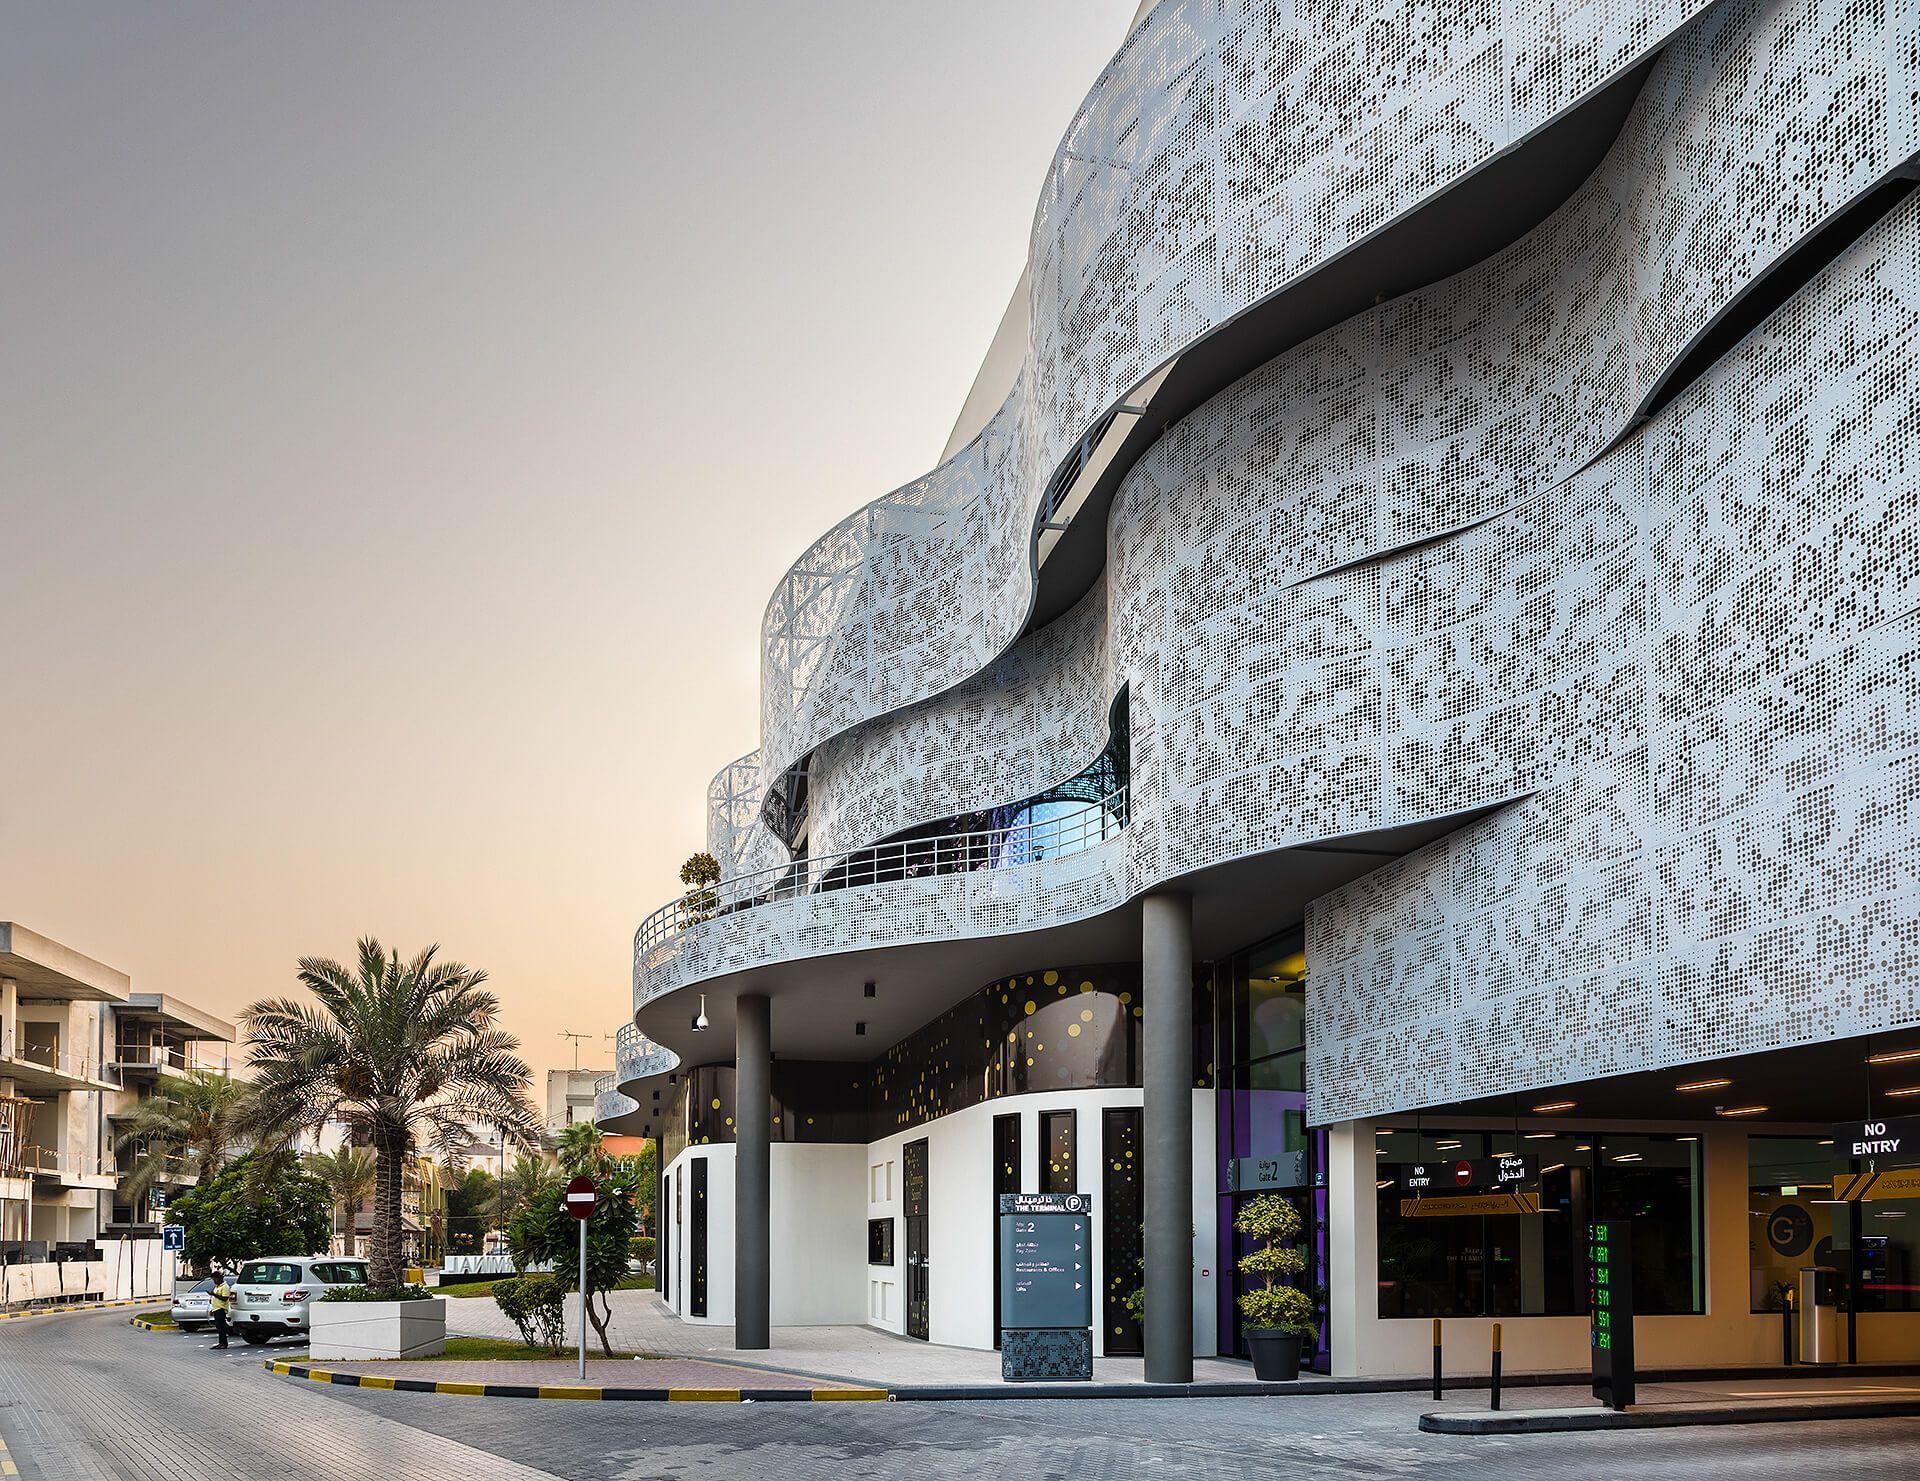 Multi Storey Car Parking Building in Adliya